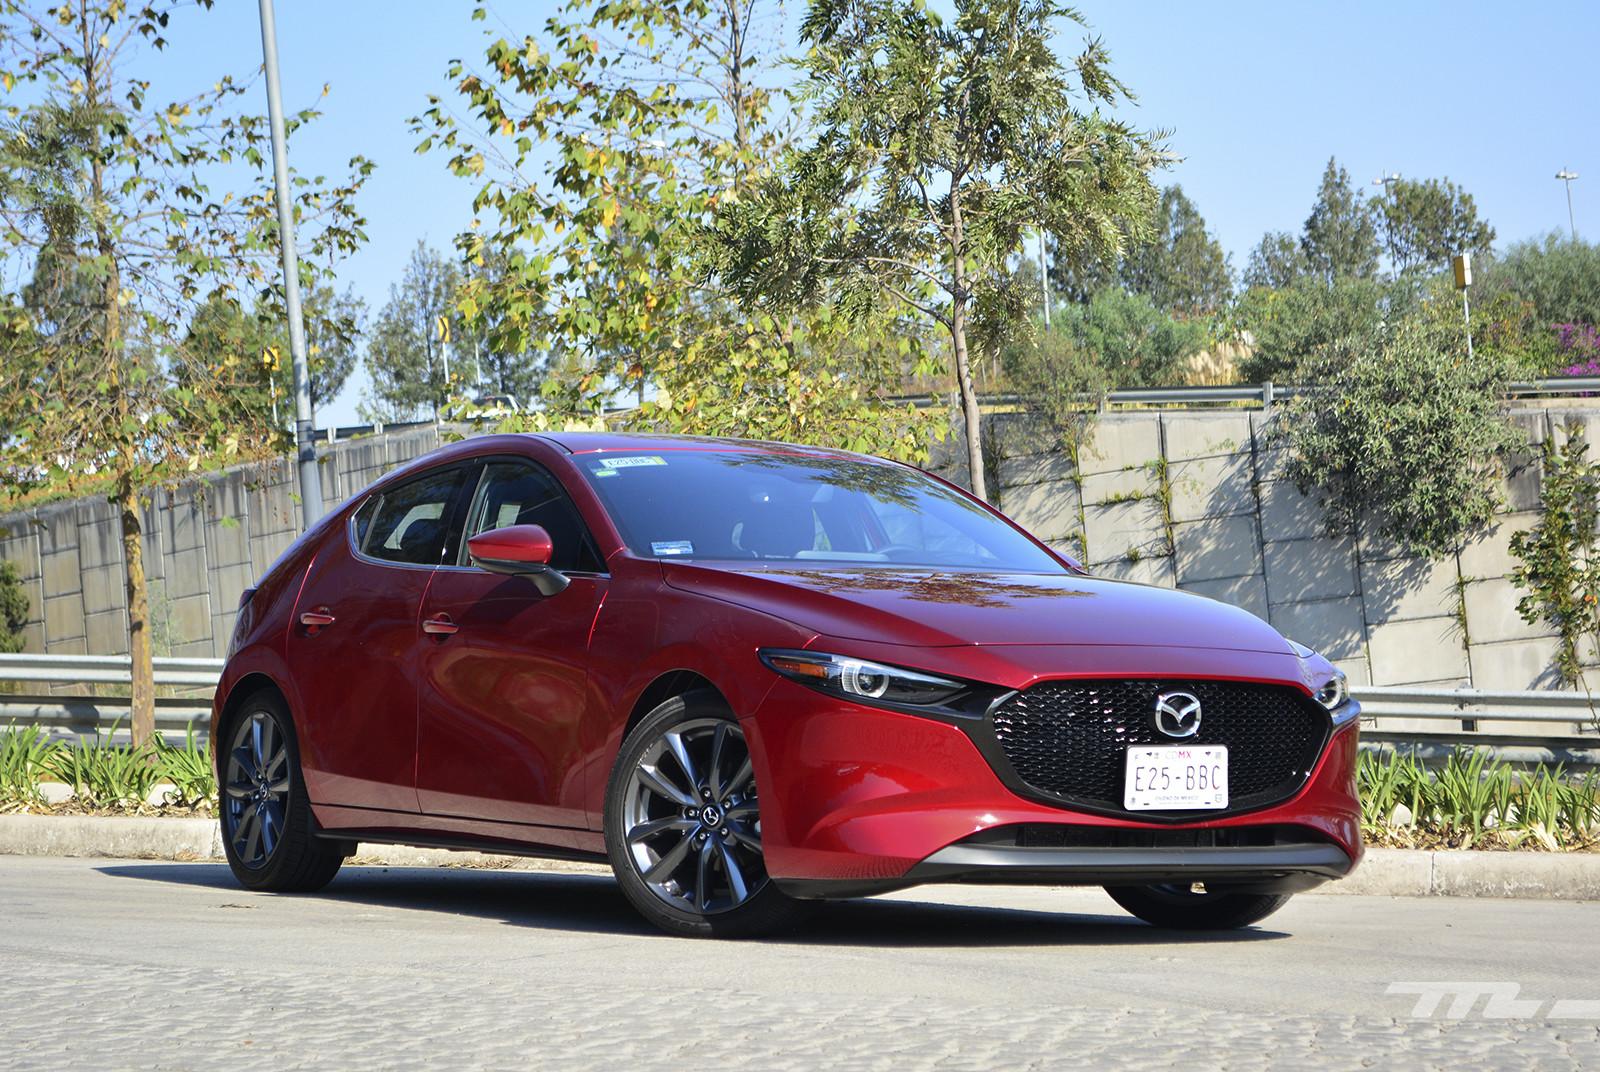 Foto de Mazda 3 vs. SEAT León (comparativa) (11/28)